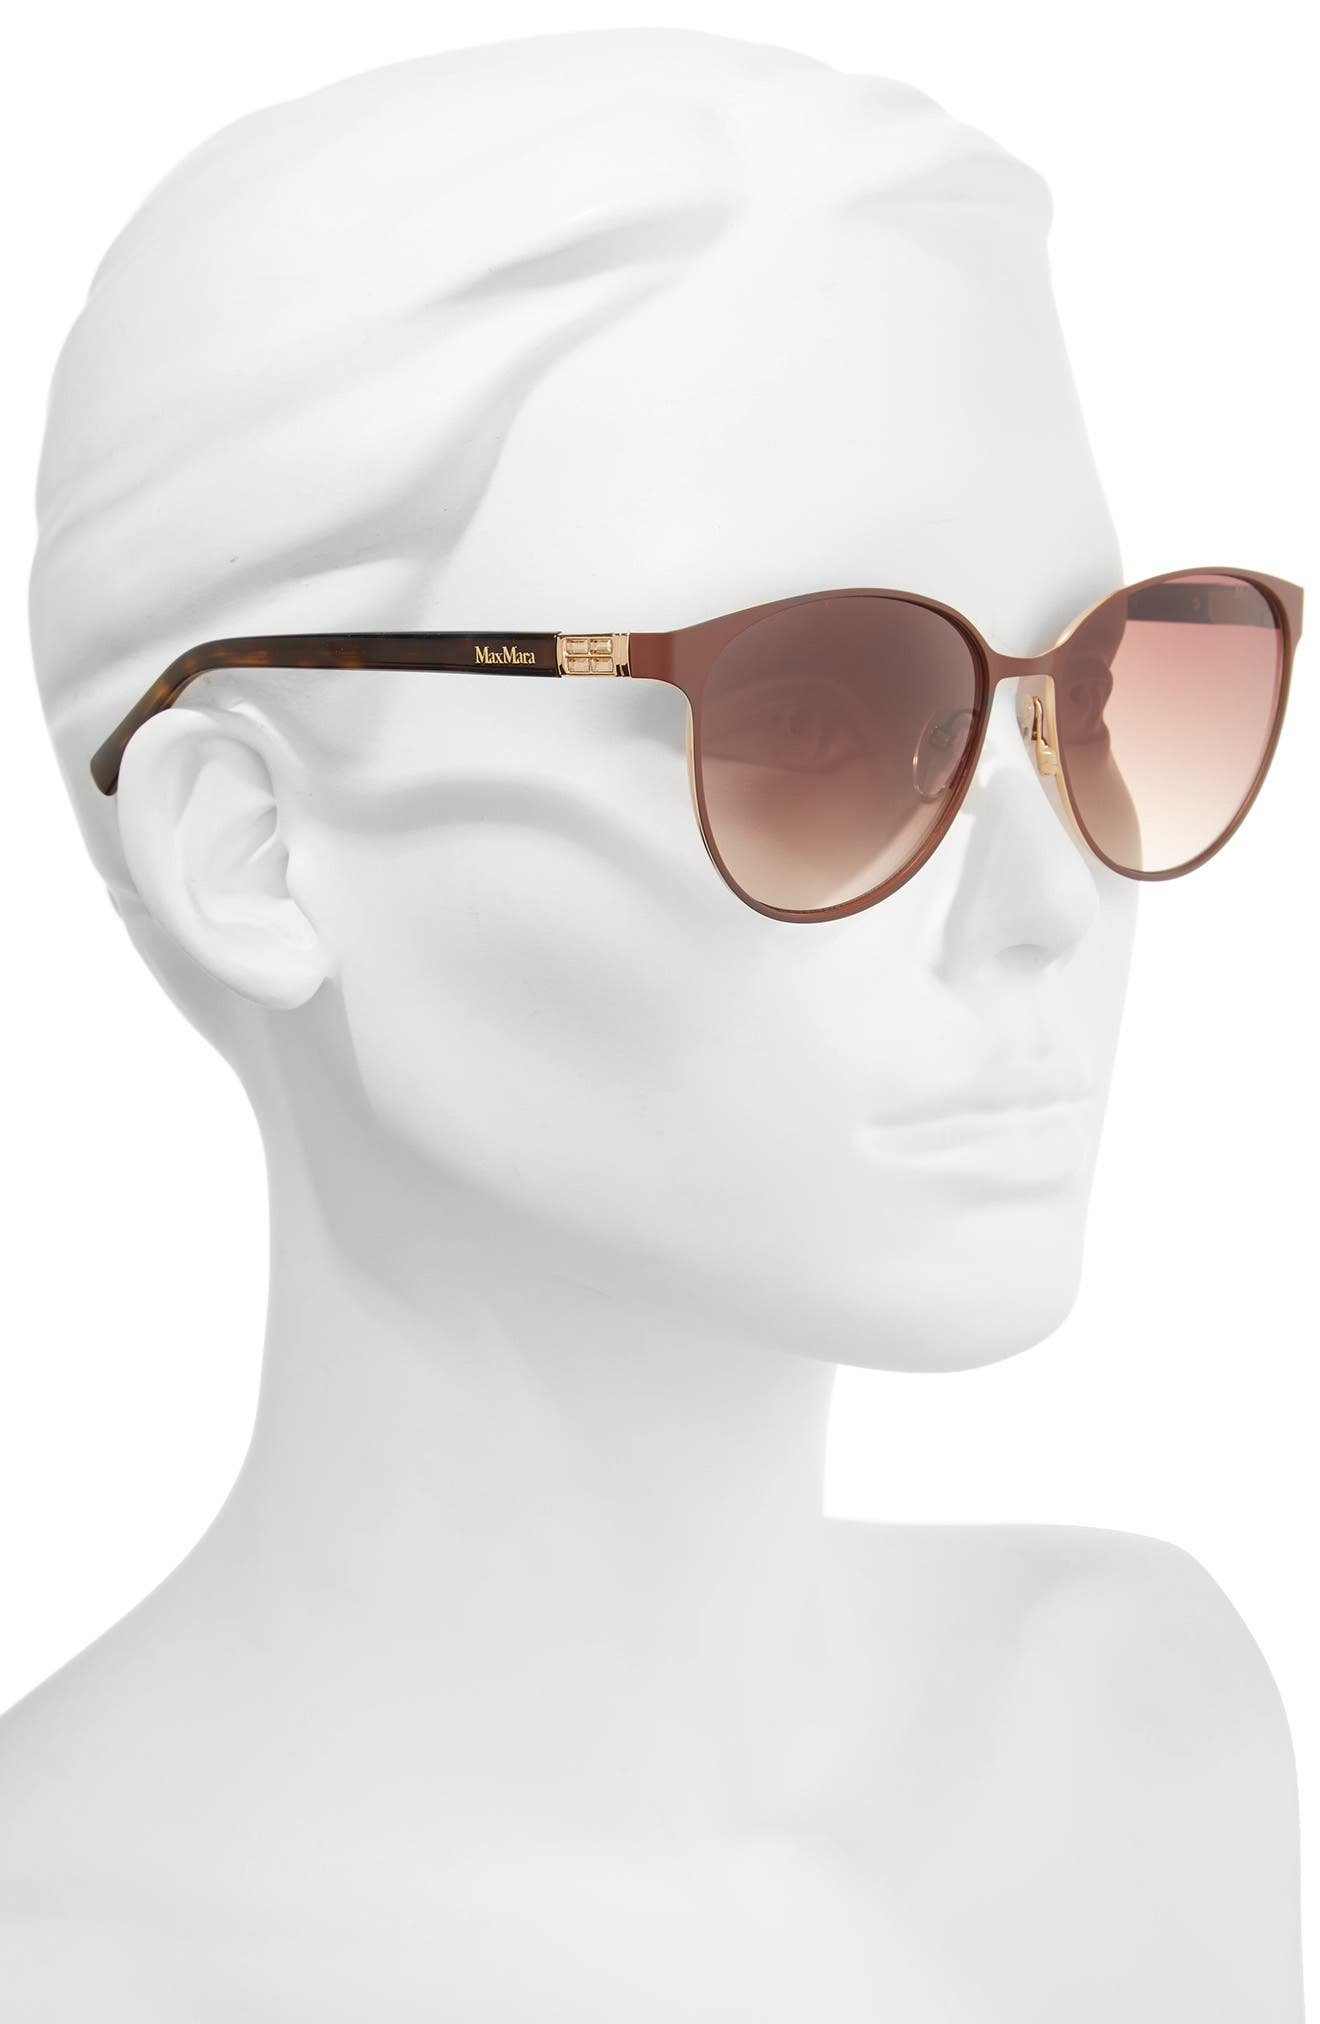 Diamov 59mm Gradient Cat Eye Sunglasses,                             Alternate thumbnail 2, color,                             Matte Brown